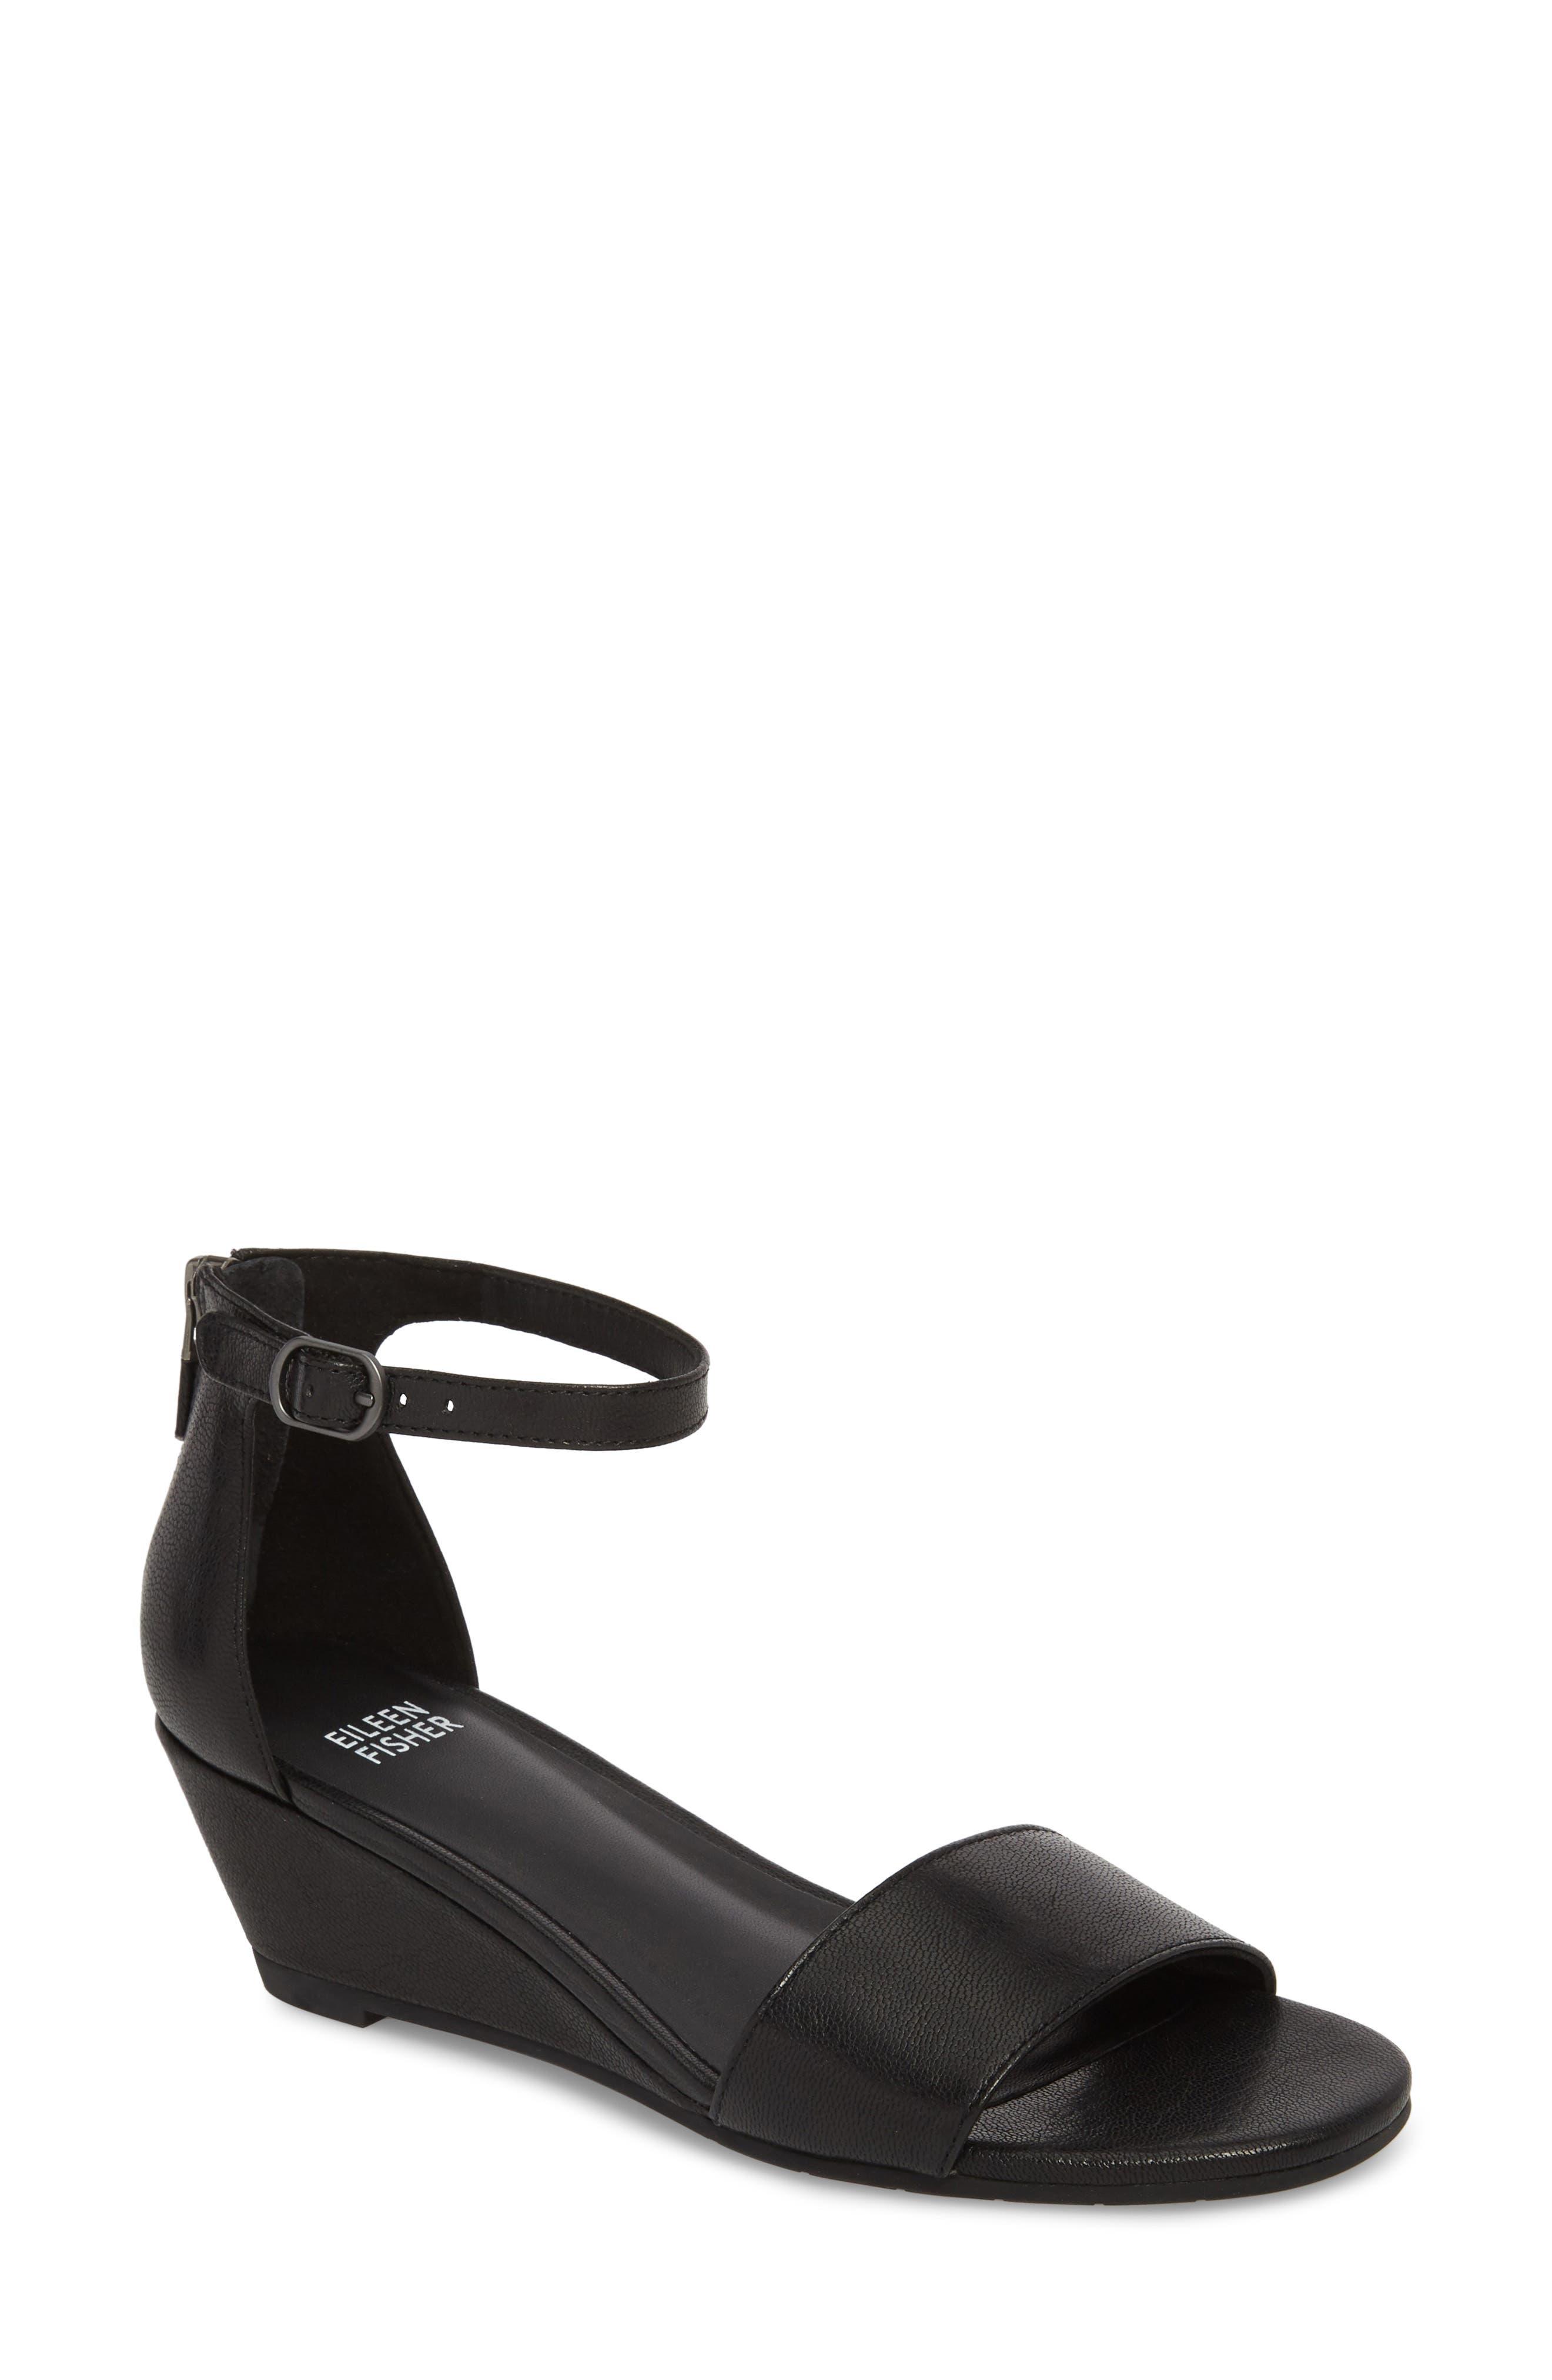 Mara Ankle Strap Wedge Sandal,                             Main thumbnail 1, color,                             Black Leather